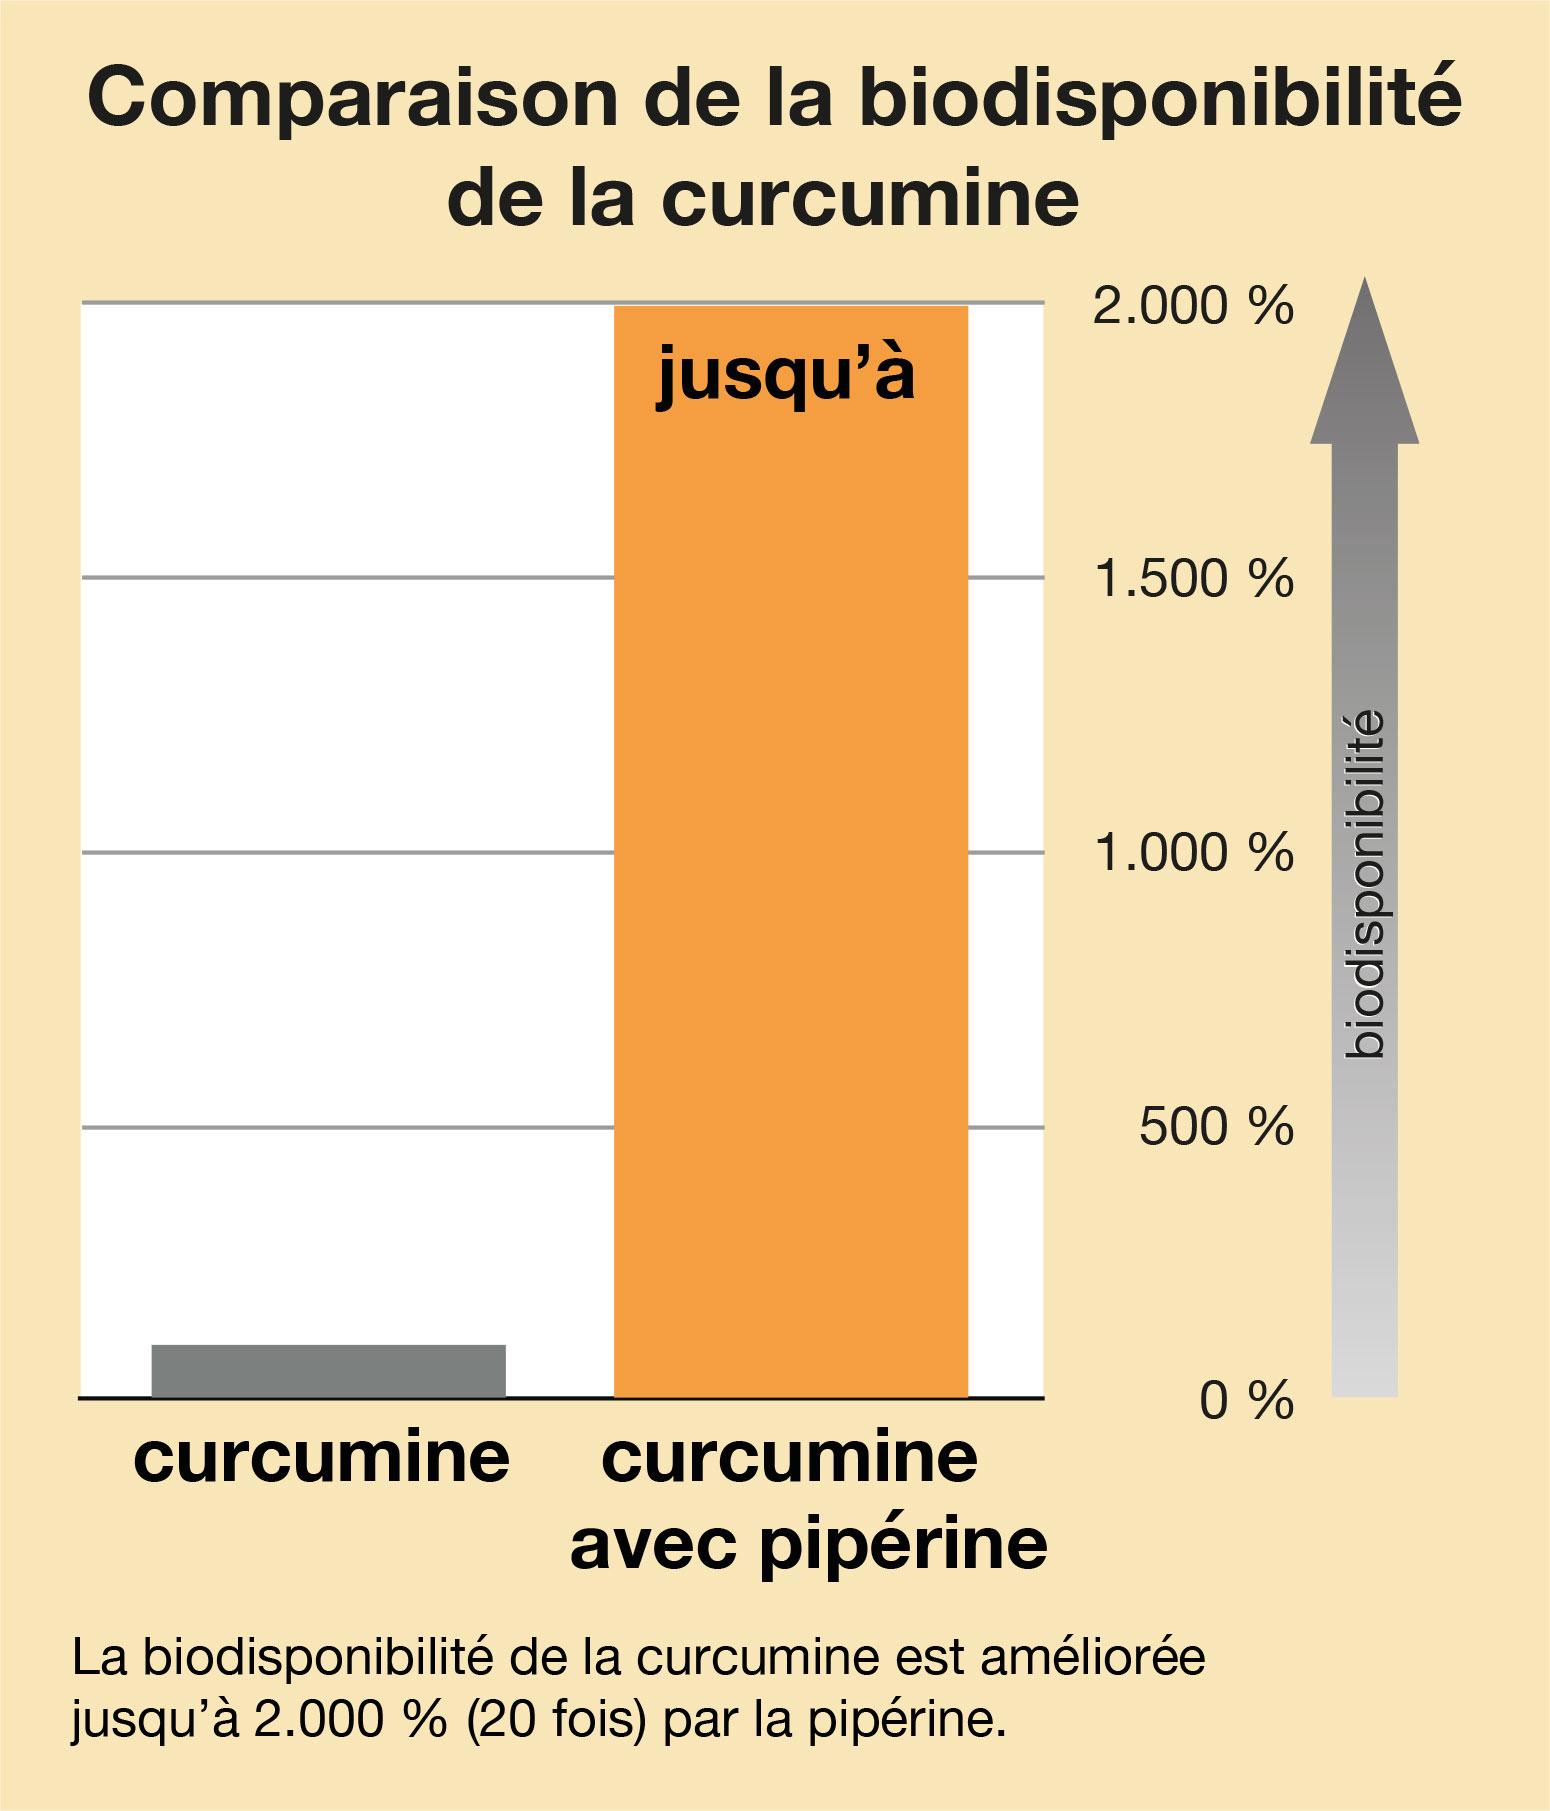 Curcumine biodisponibilité